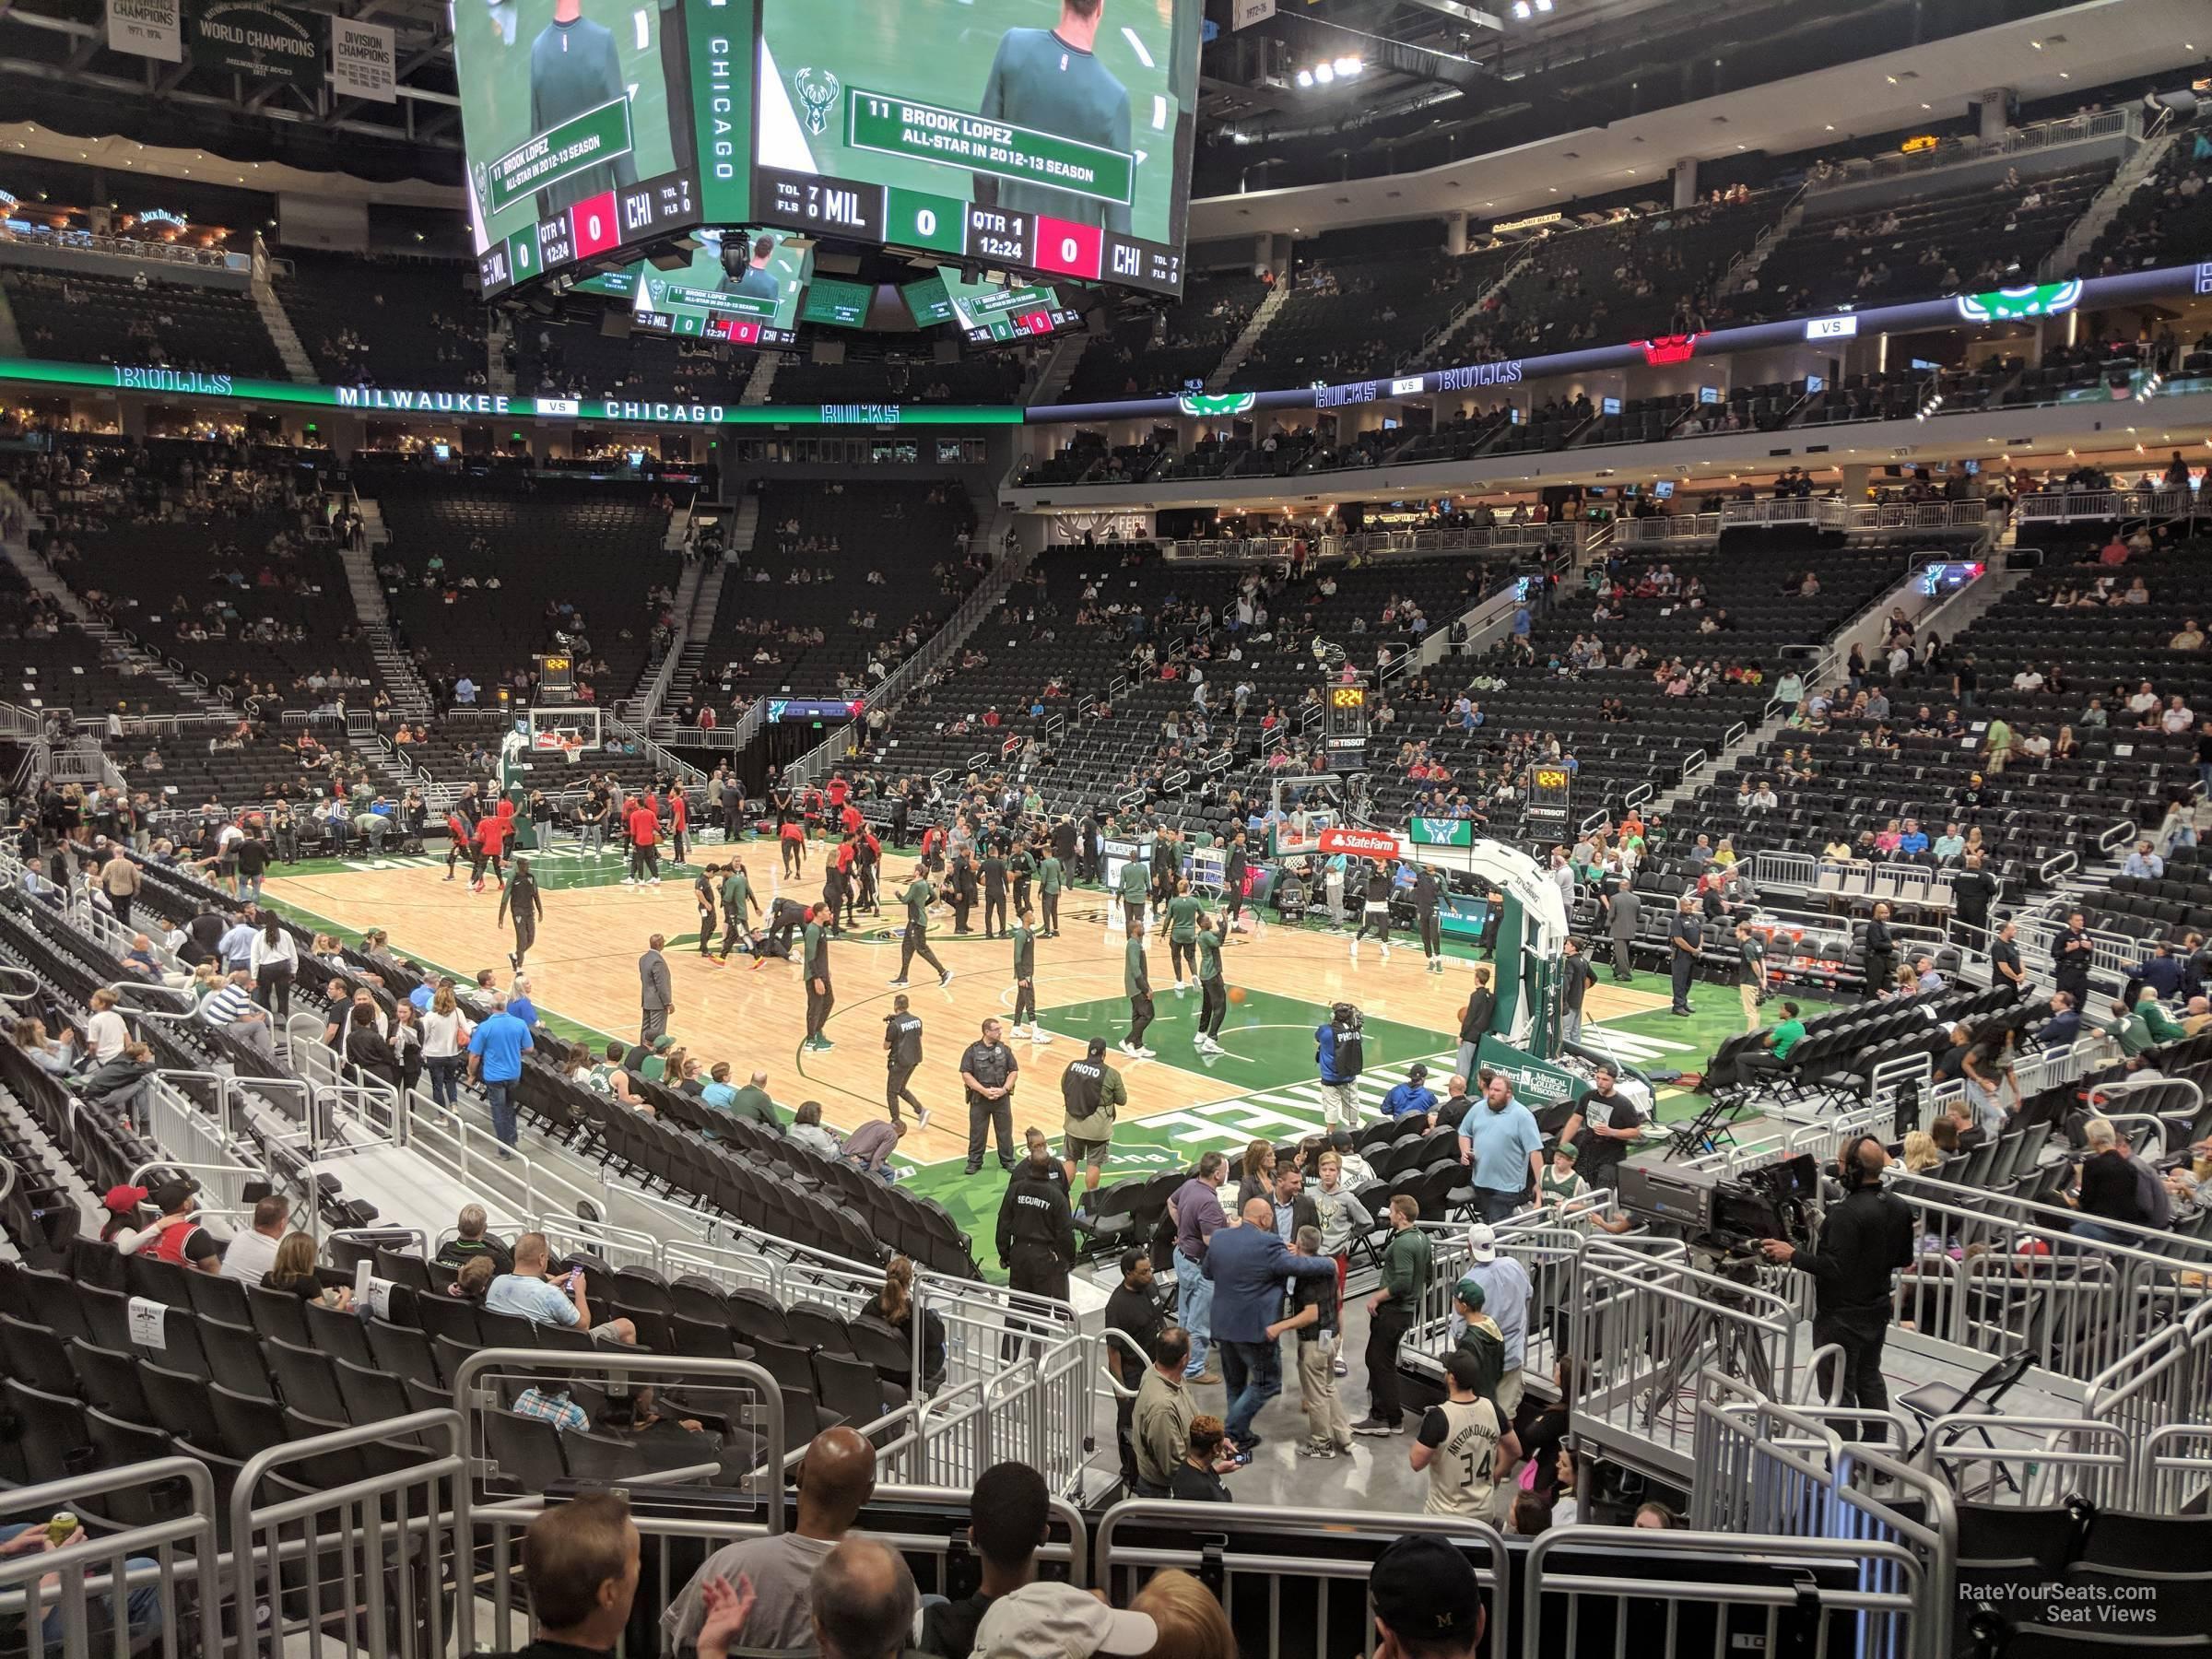 Fiserv Forum Section 103 - Milwaukee Bucks - RateYourSeats.com